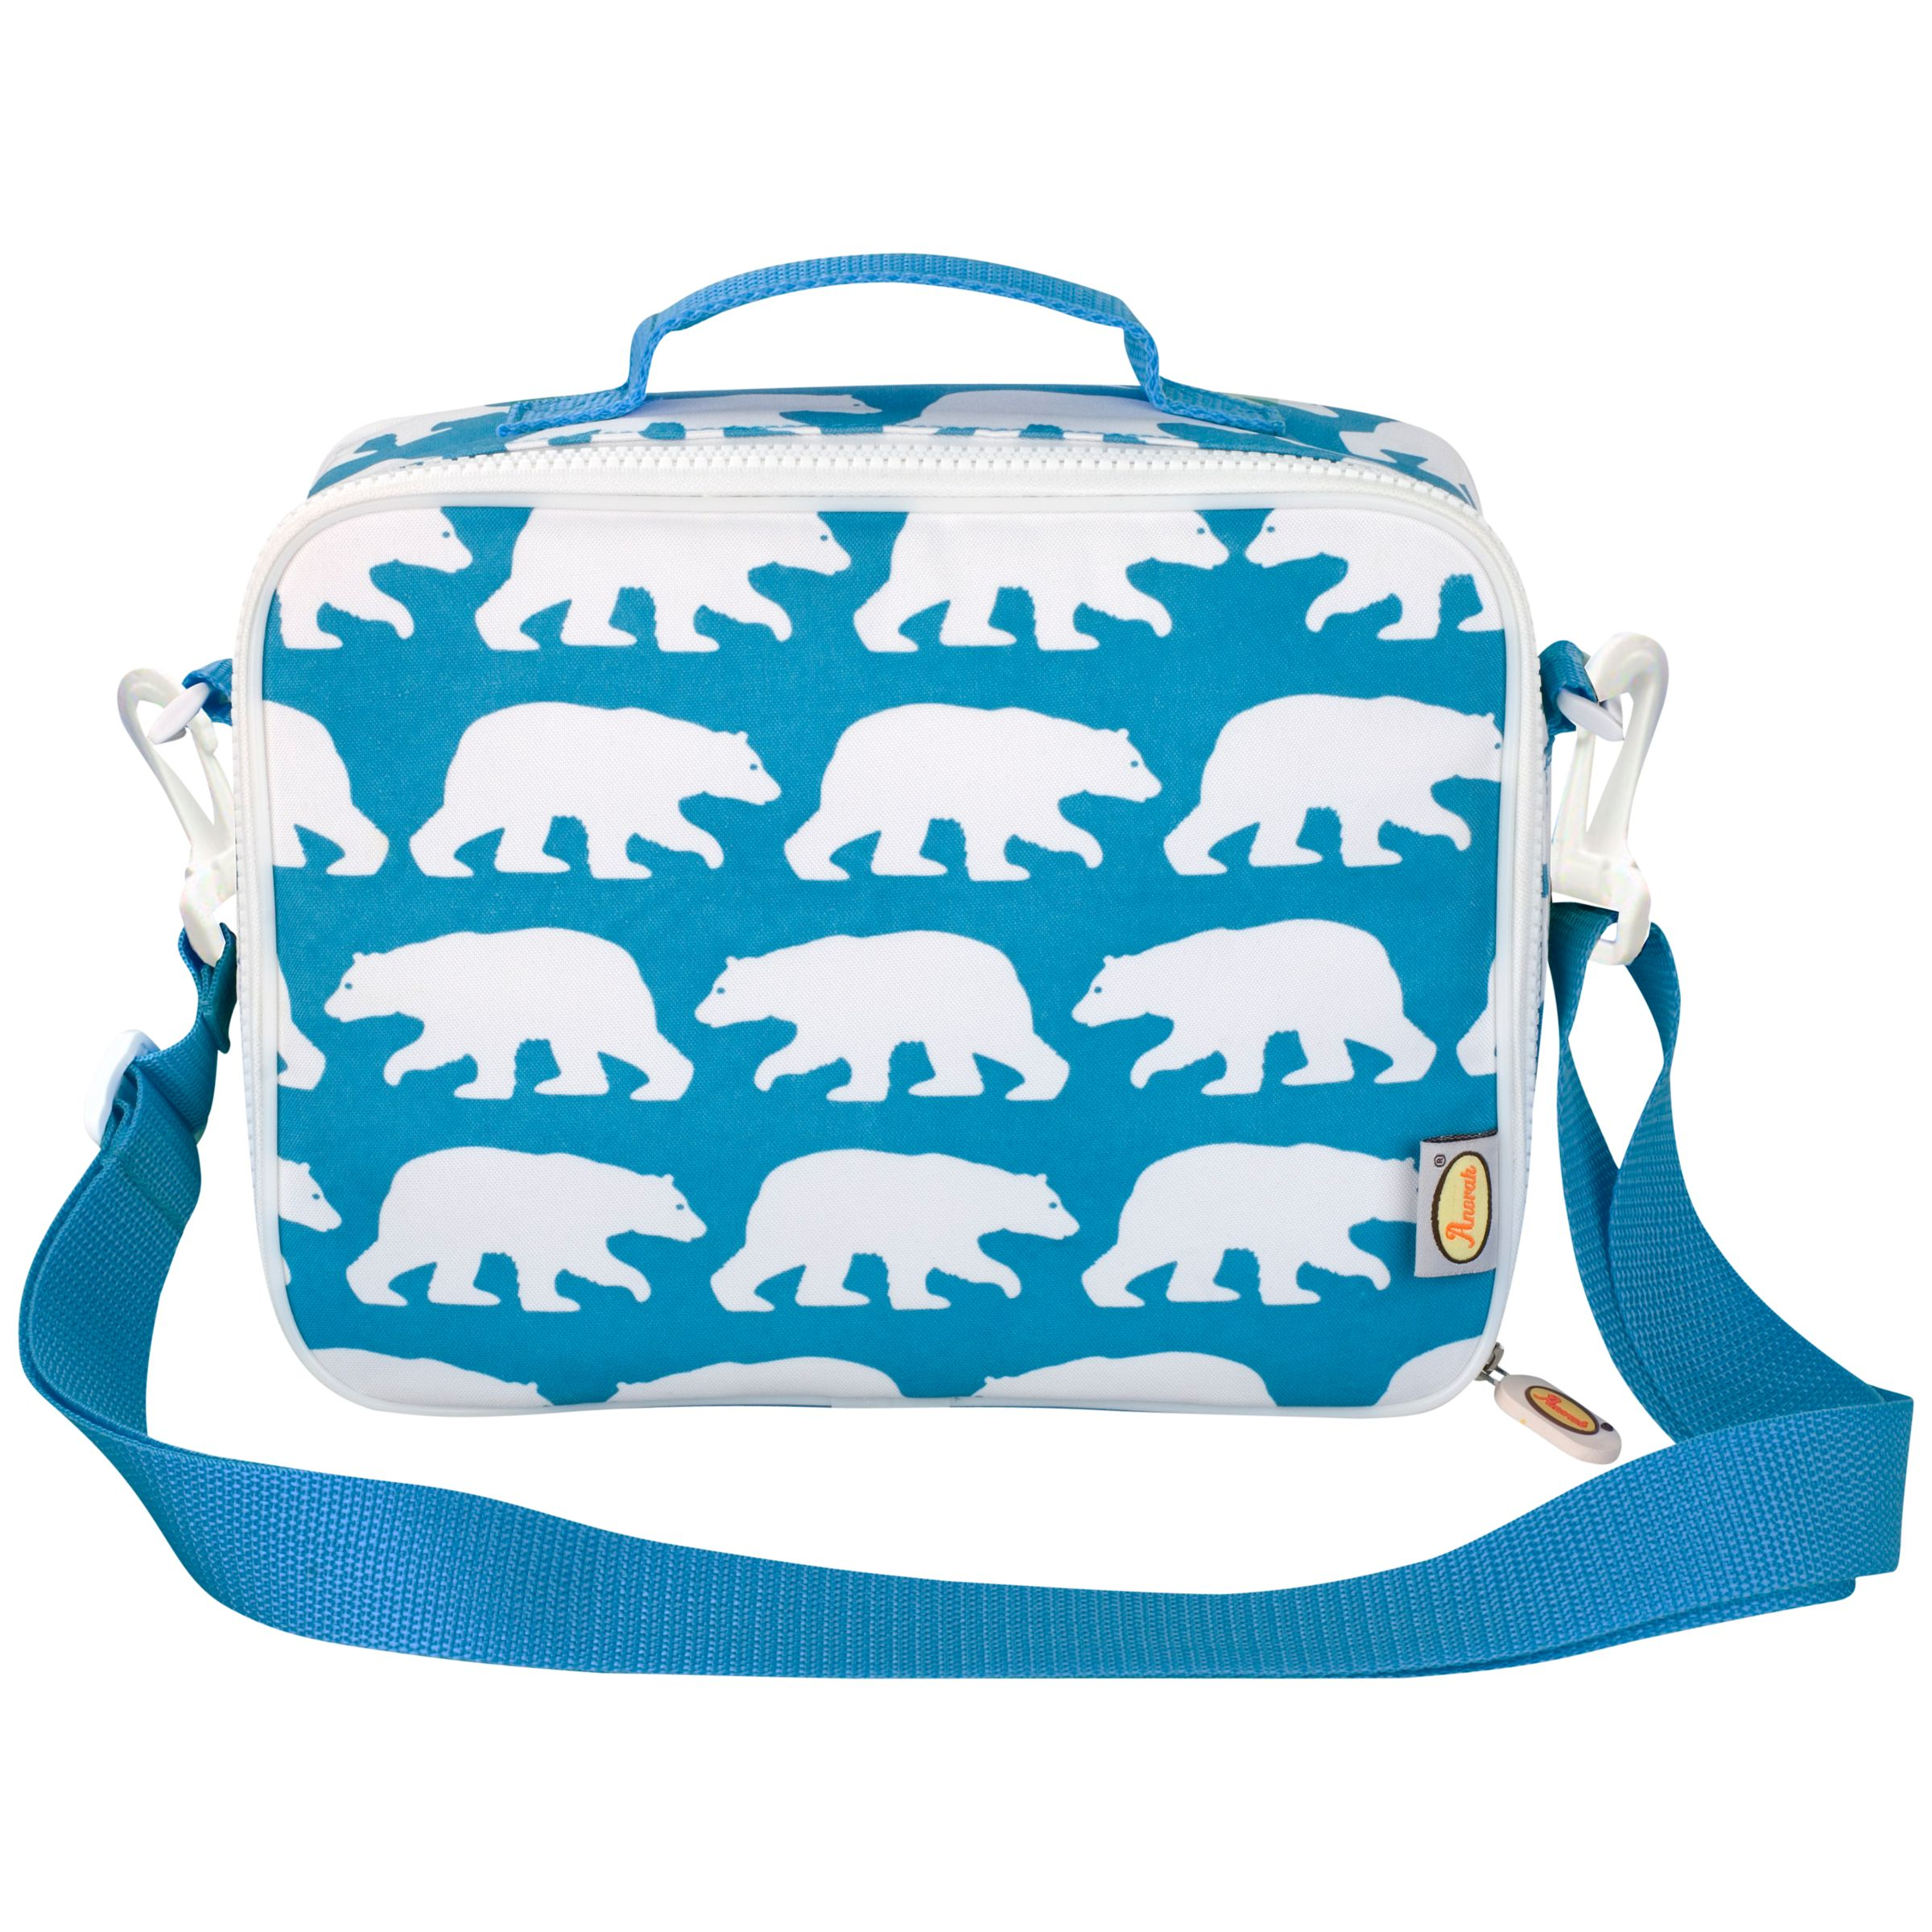 Anorak Kissing Bears Lunchbox